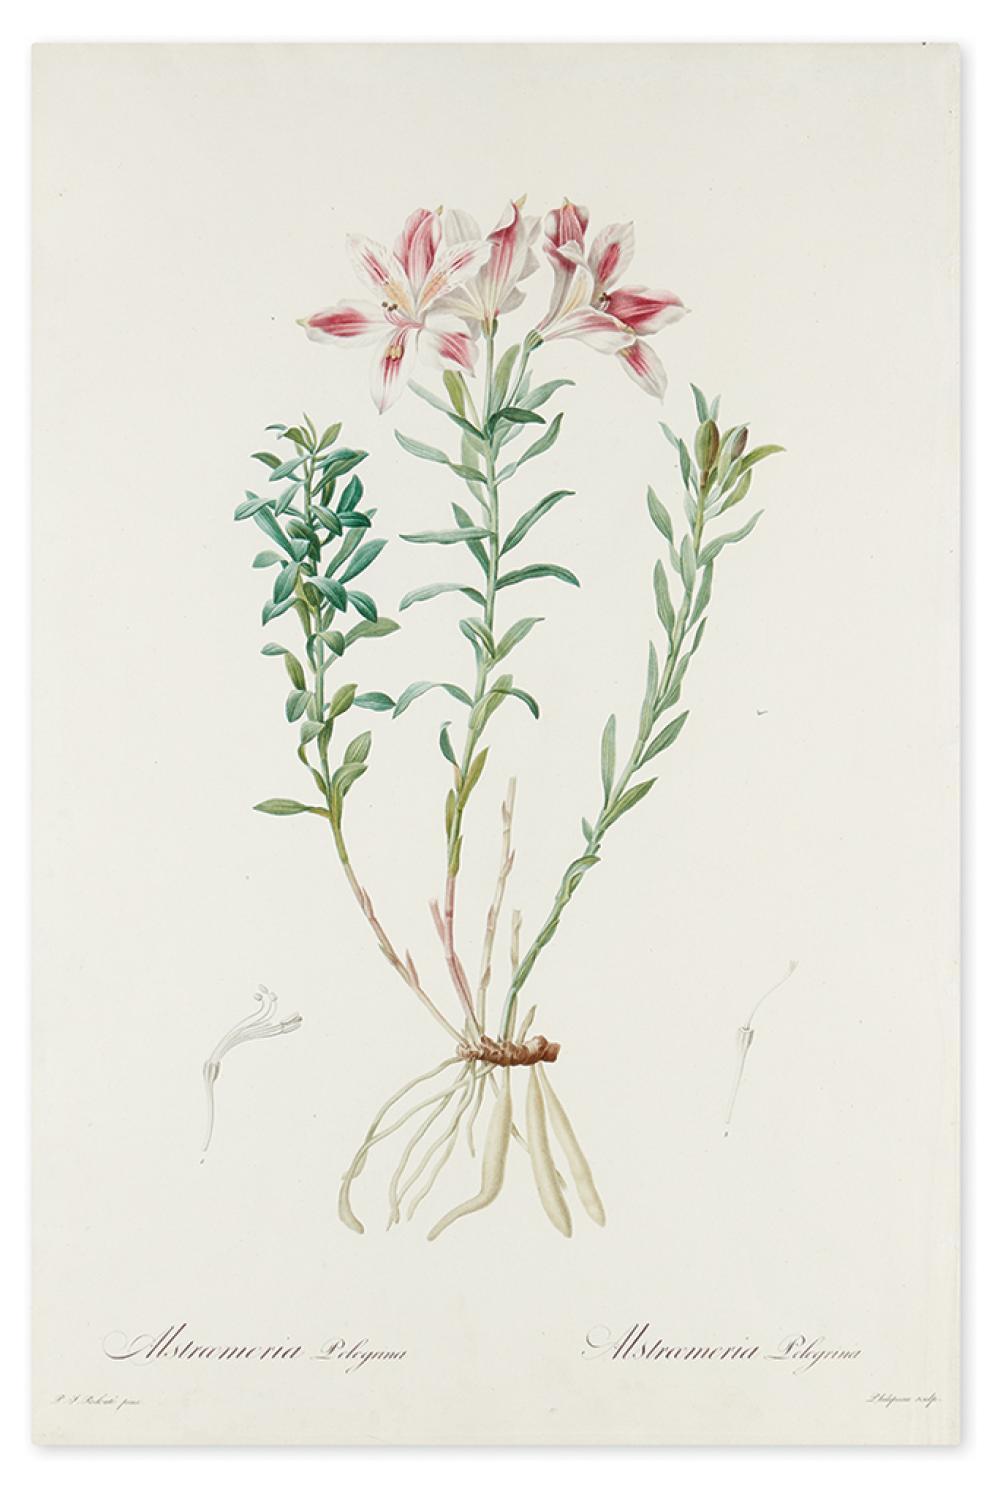 REDOUTÉ, PIERRE-JOSEPH. Alstroemeria Pelegrina [Pelegrinan Incan Lily].